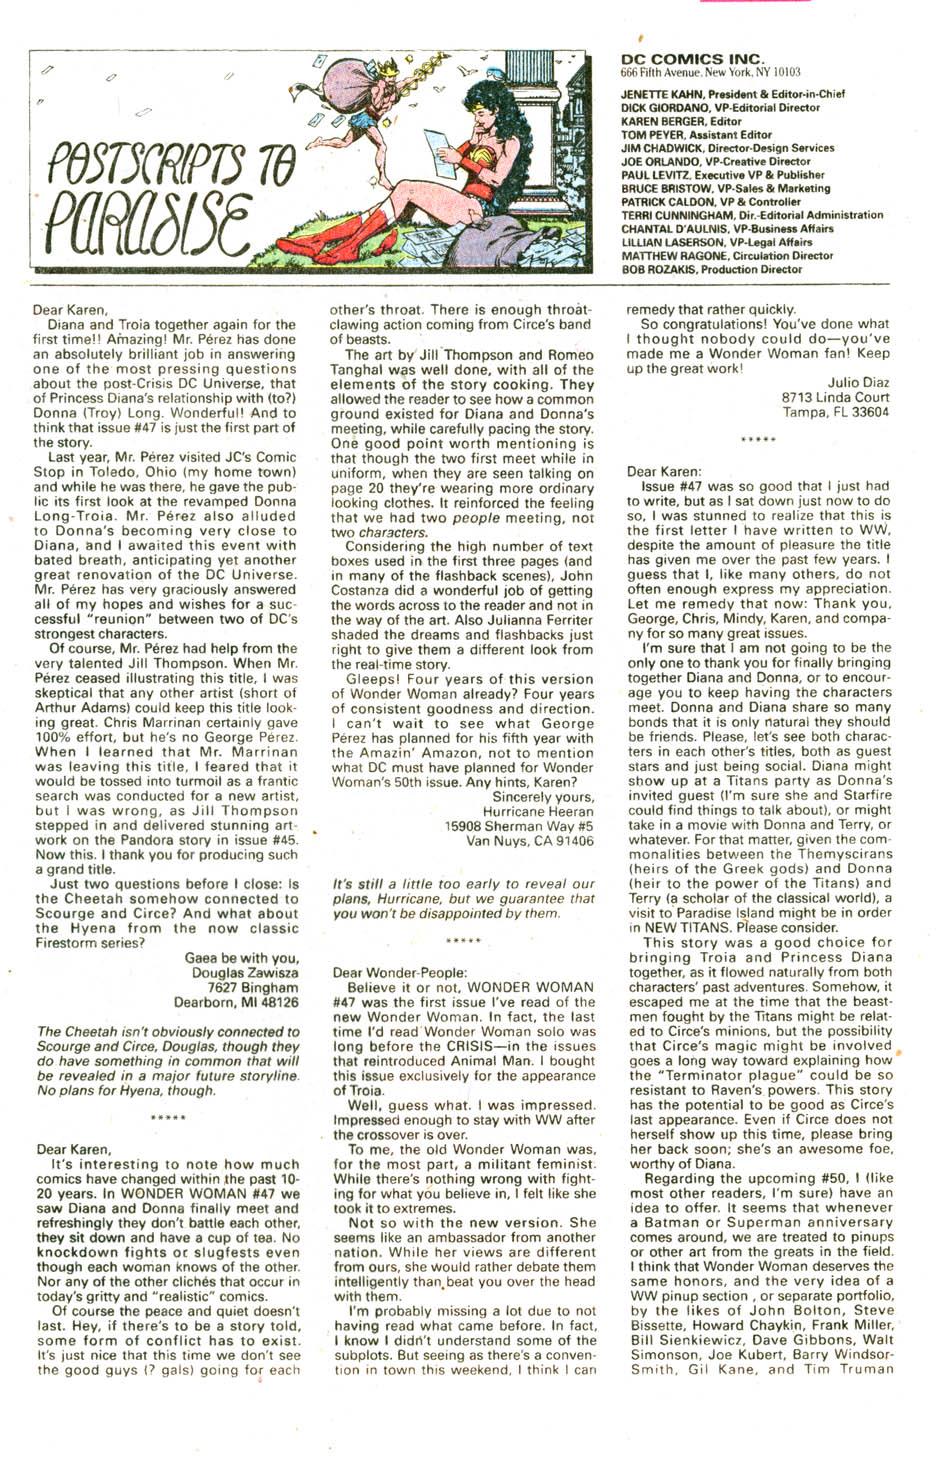 Read online Wonder Woman (1987) comic -  Issue #51 - 25